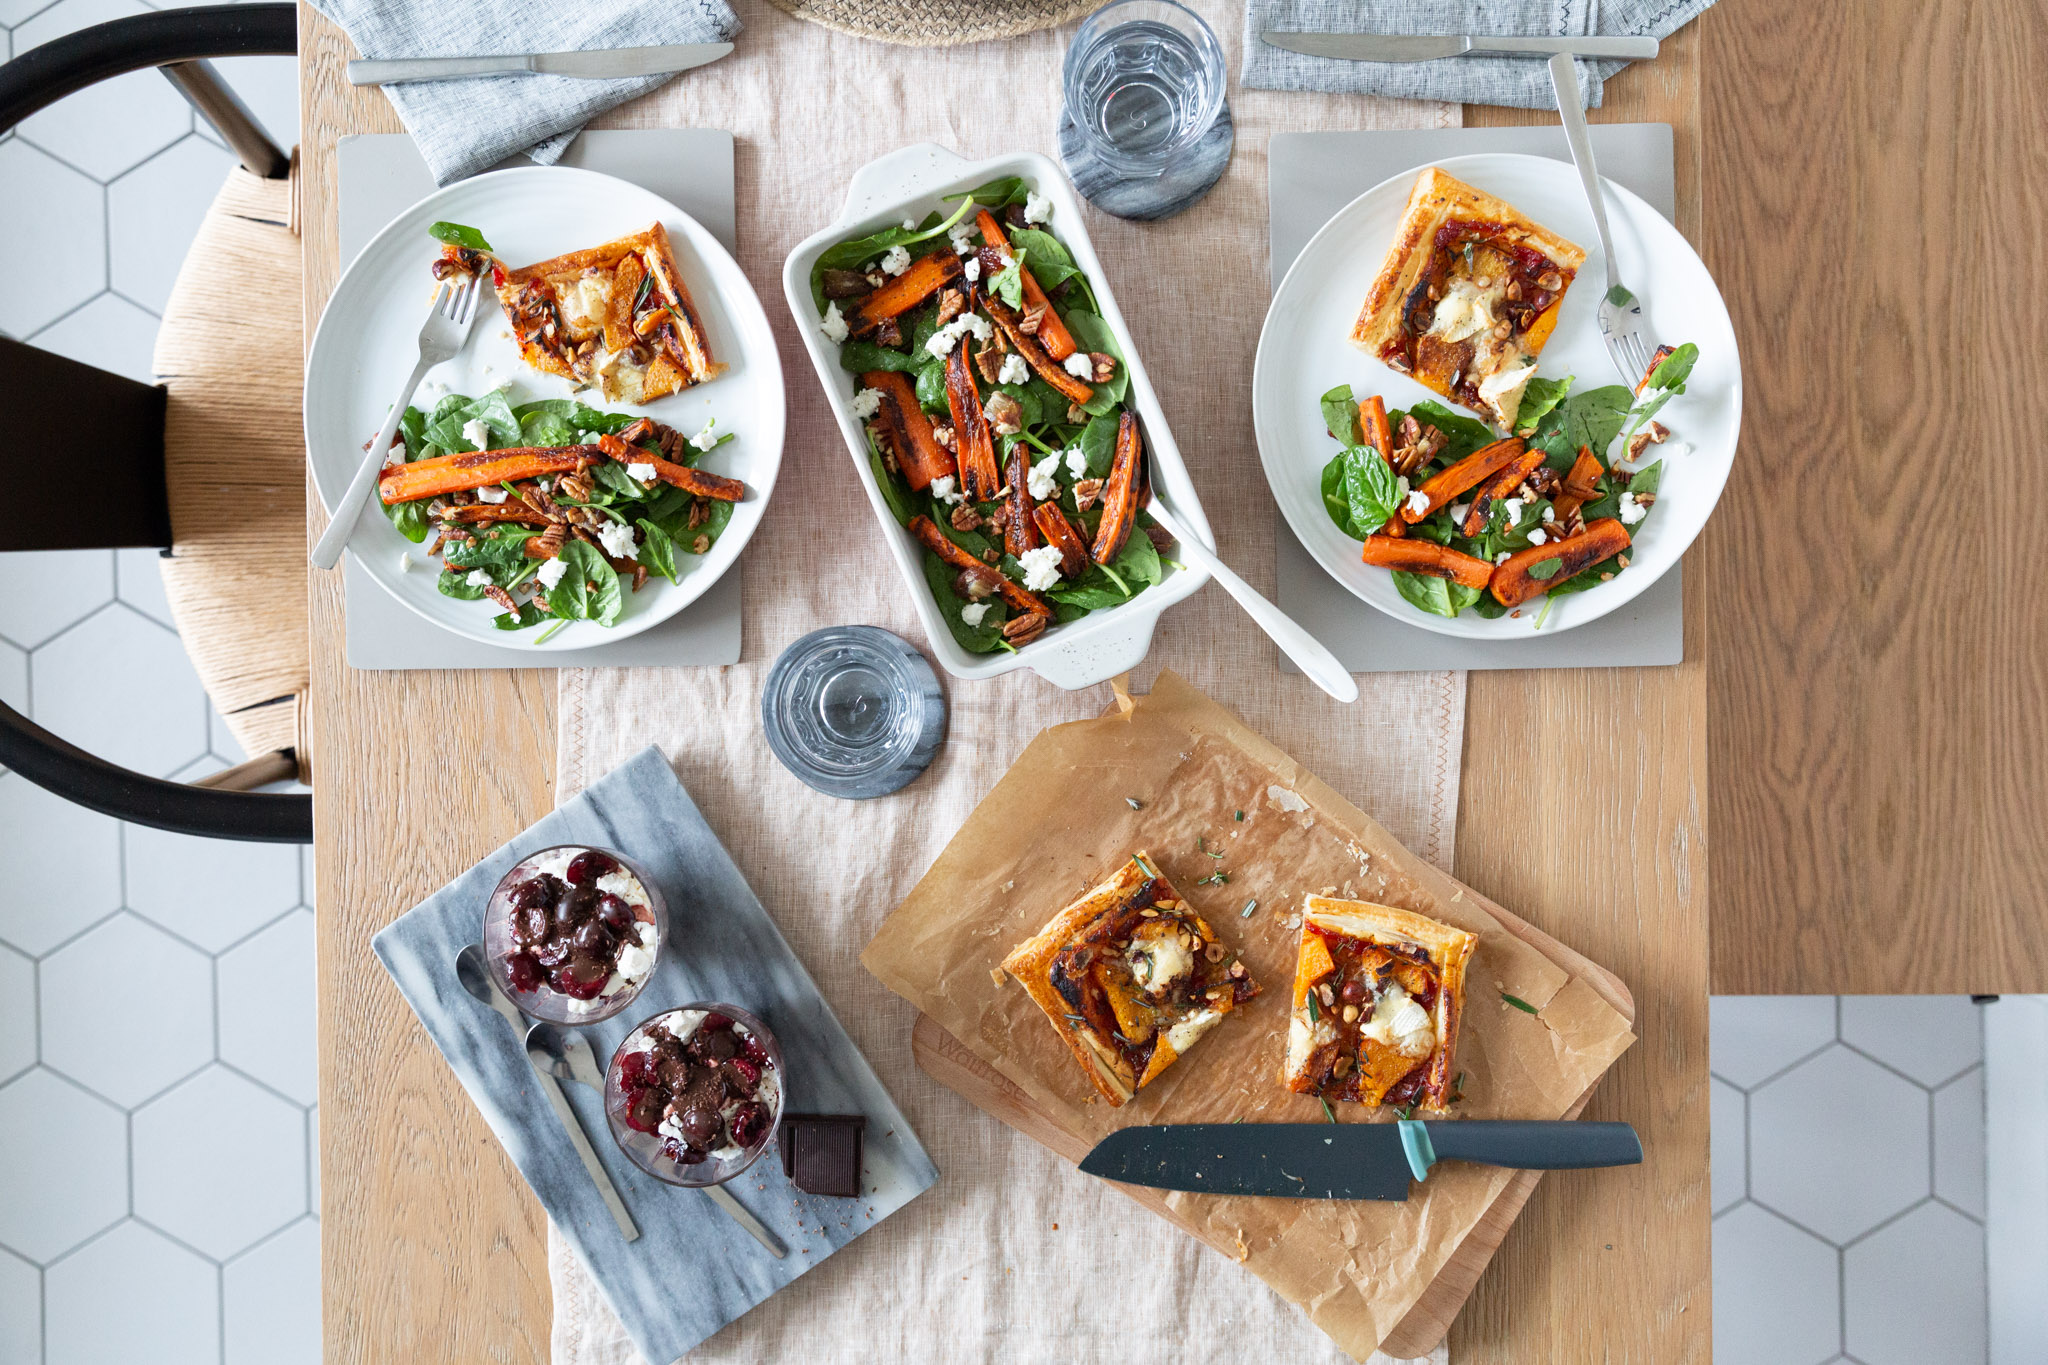 The Three Waitrose Partners Festive Recipes You Need This